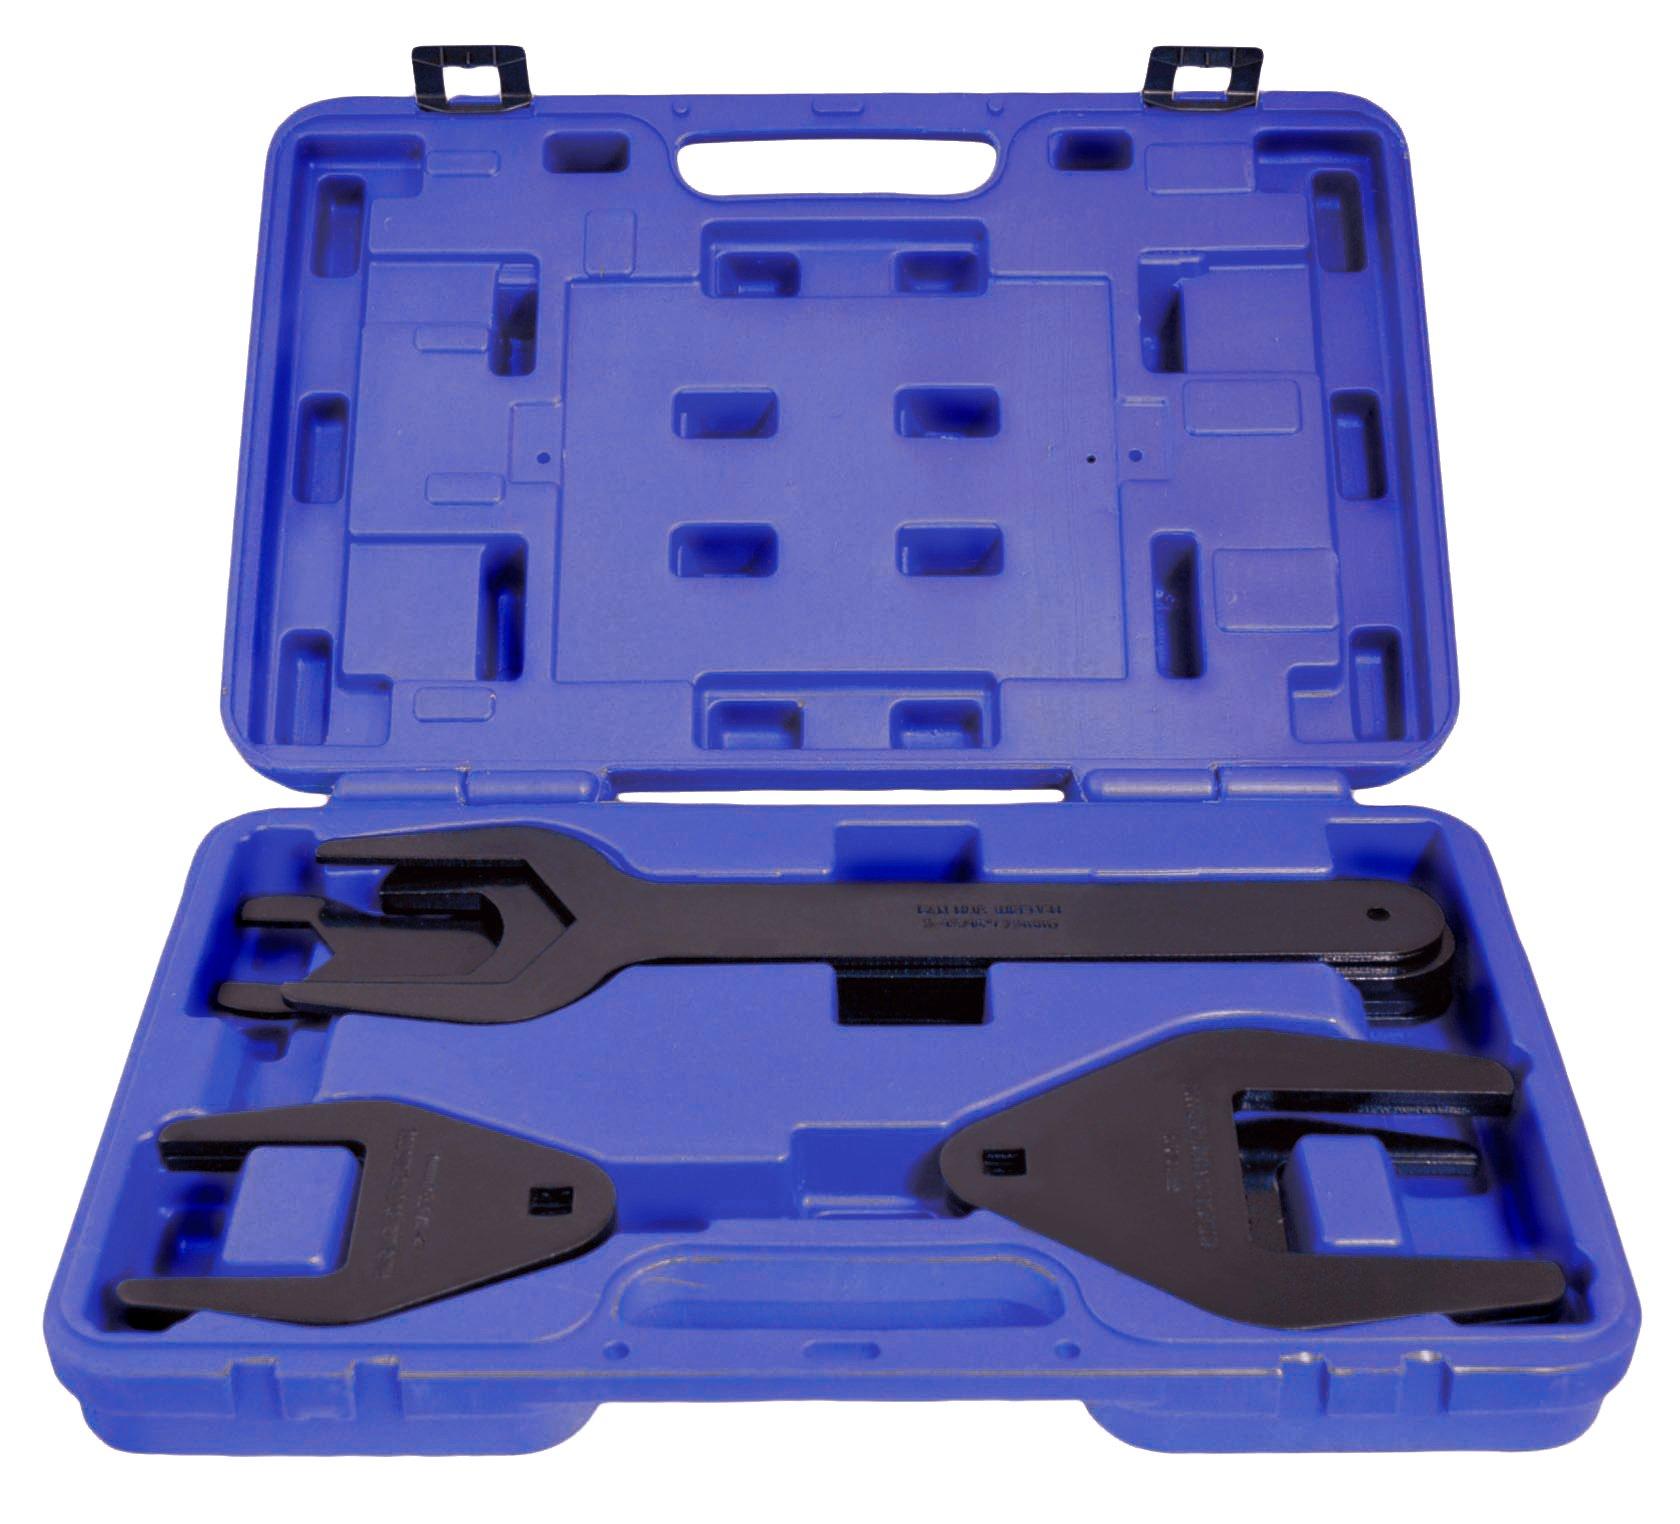 Astro 7895 10-Piece Fan Clutch Wrench Set